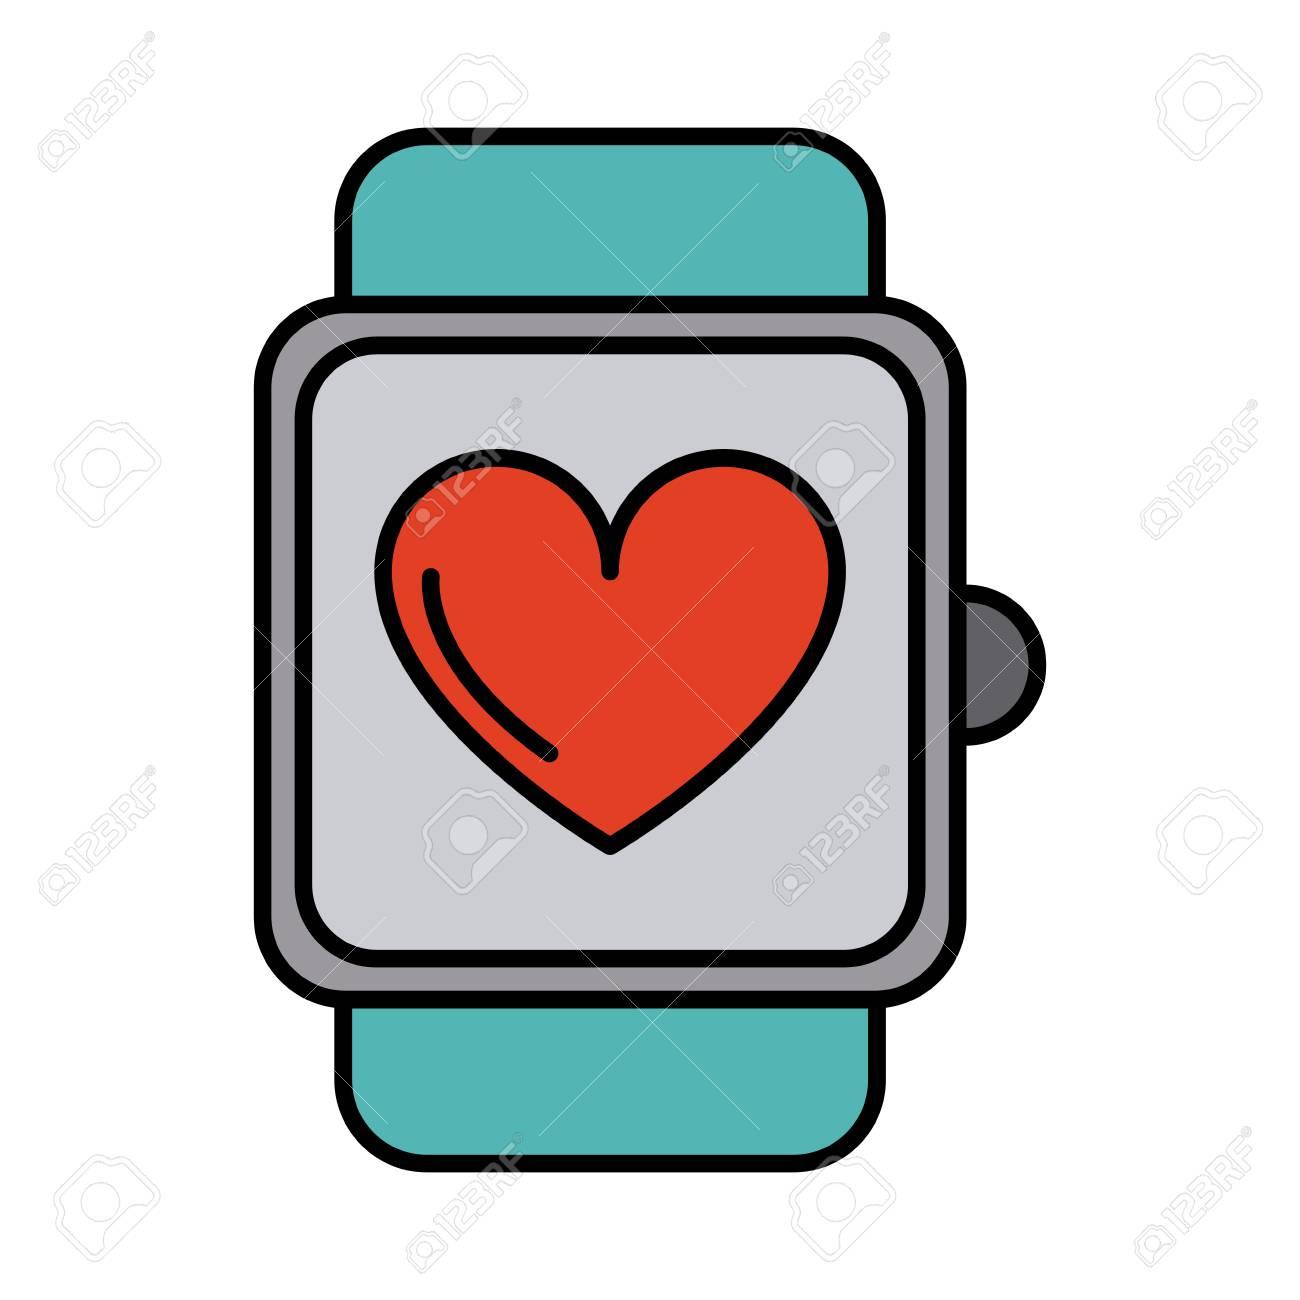 1300x1300 Heart Rate Wrist Monitor Icon Image Vector Illustration Design